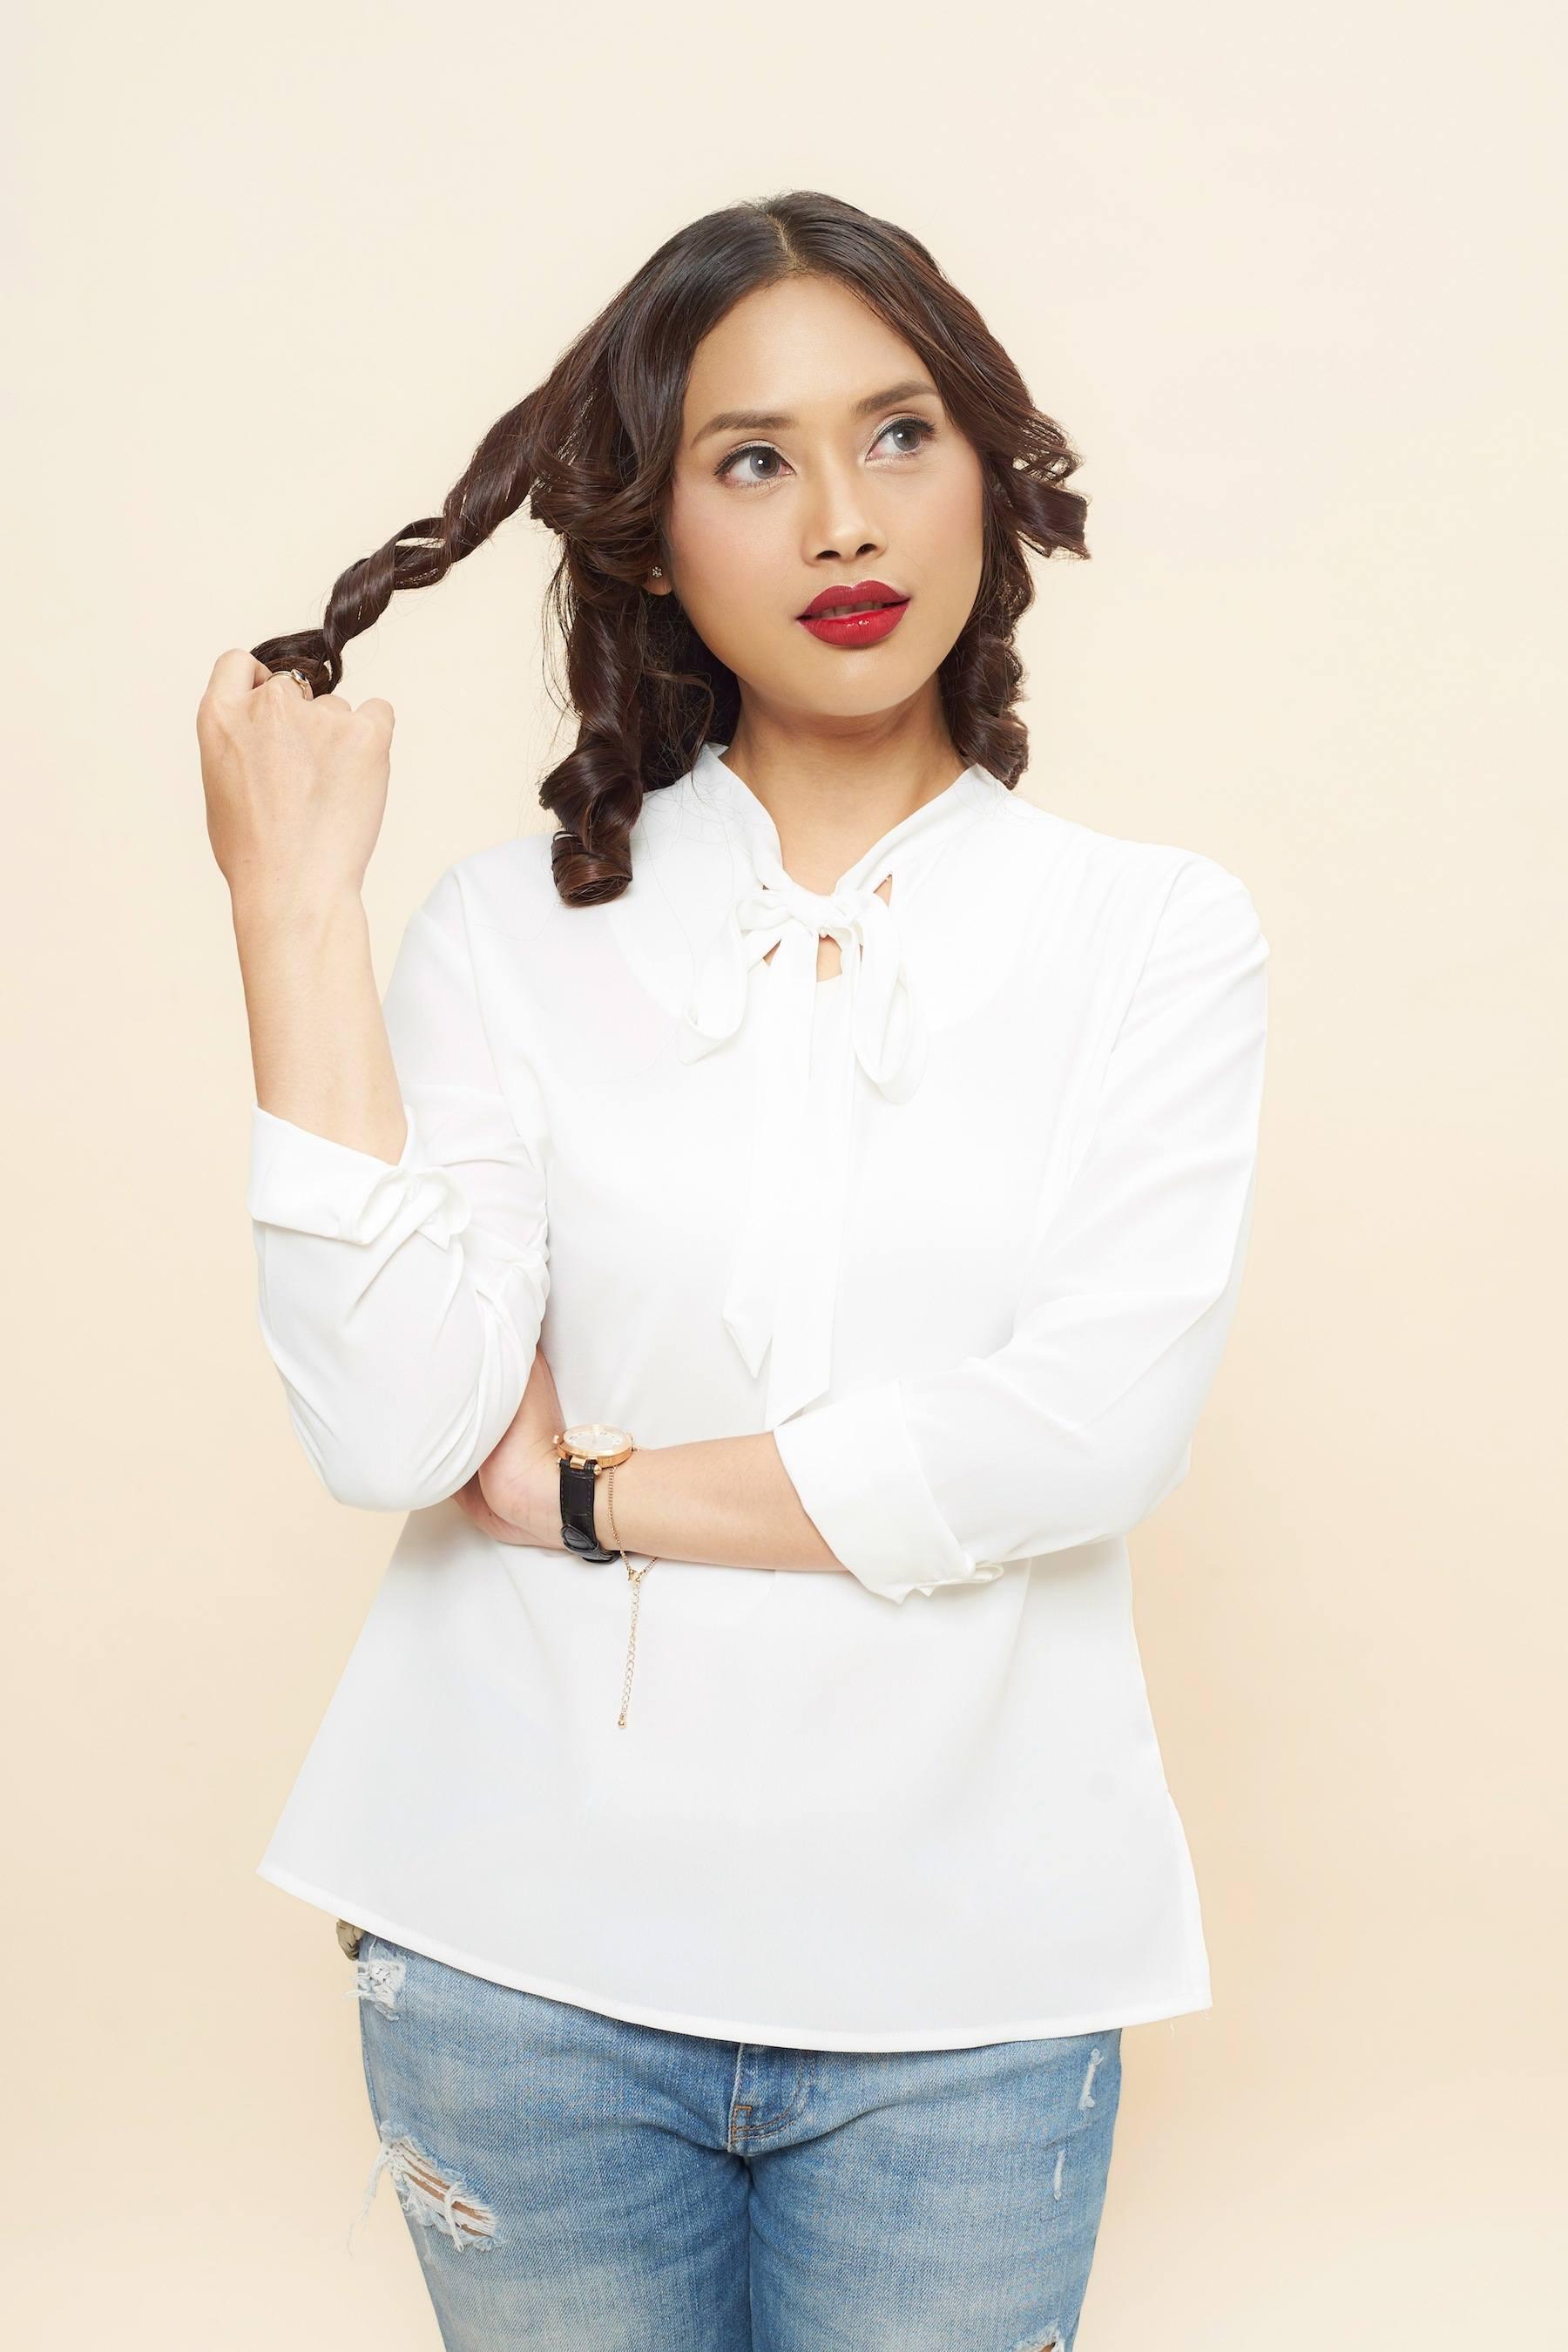 Model Rambut Sebahu Untuk Wanita